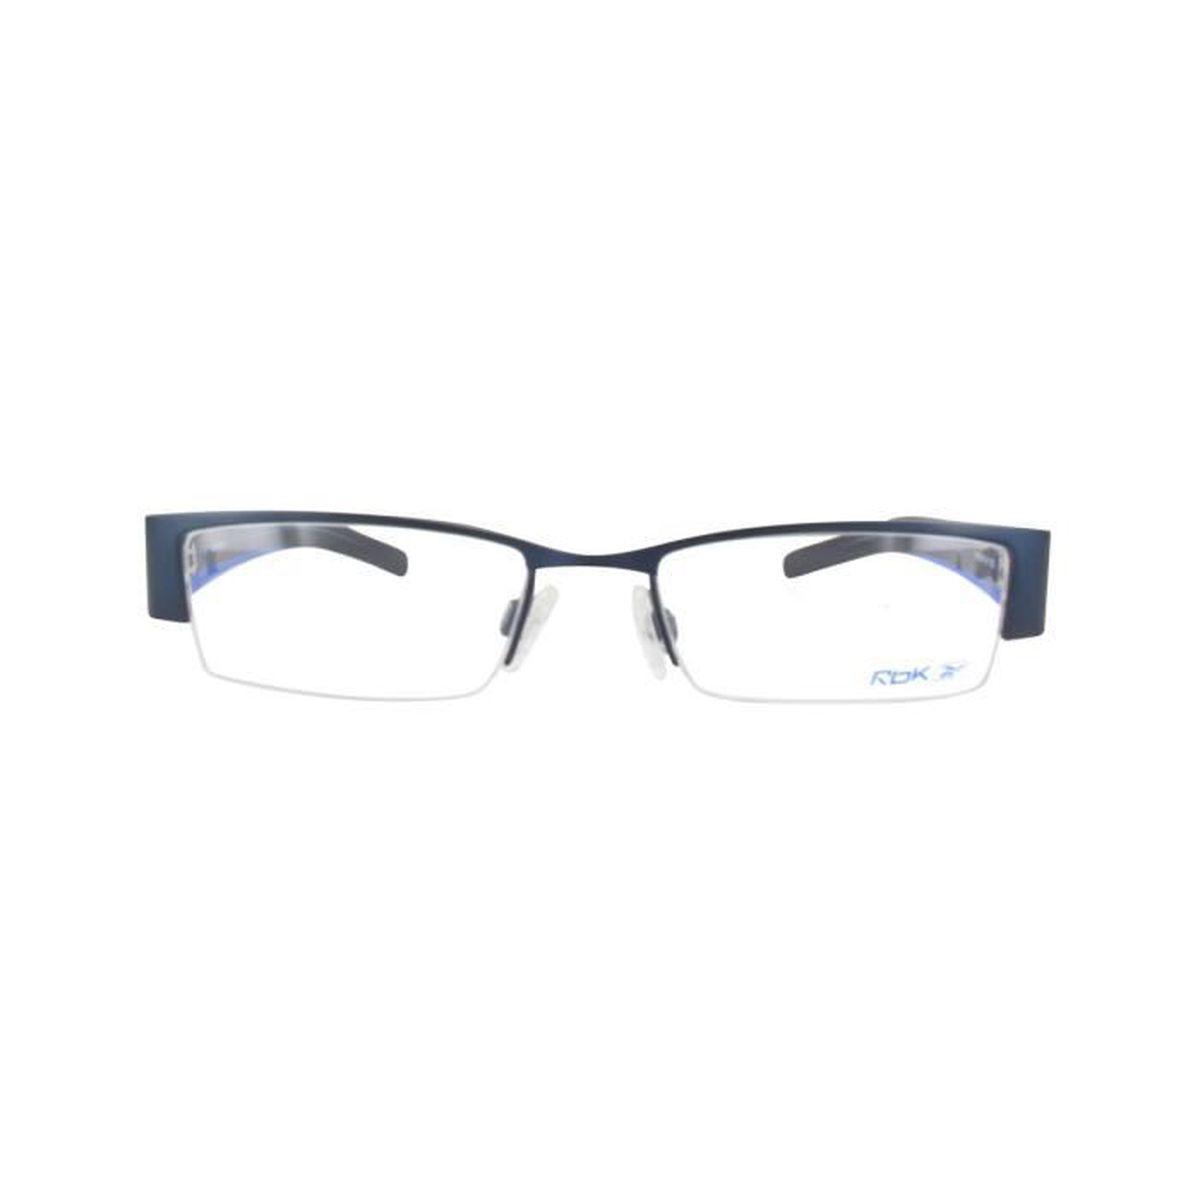 reebok lunettes femme bleu